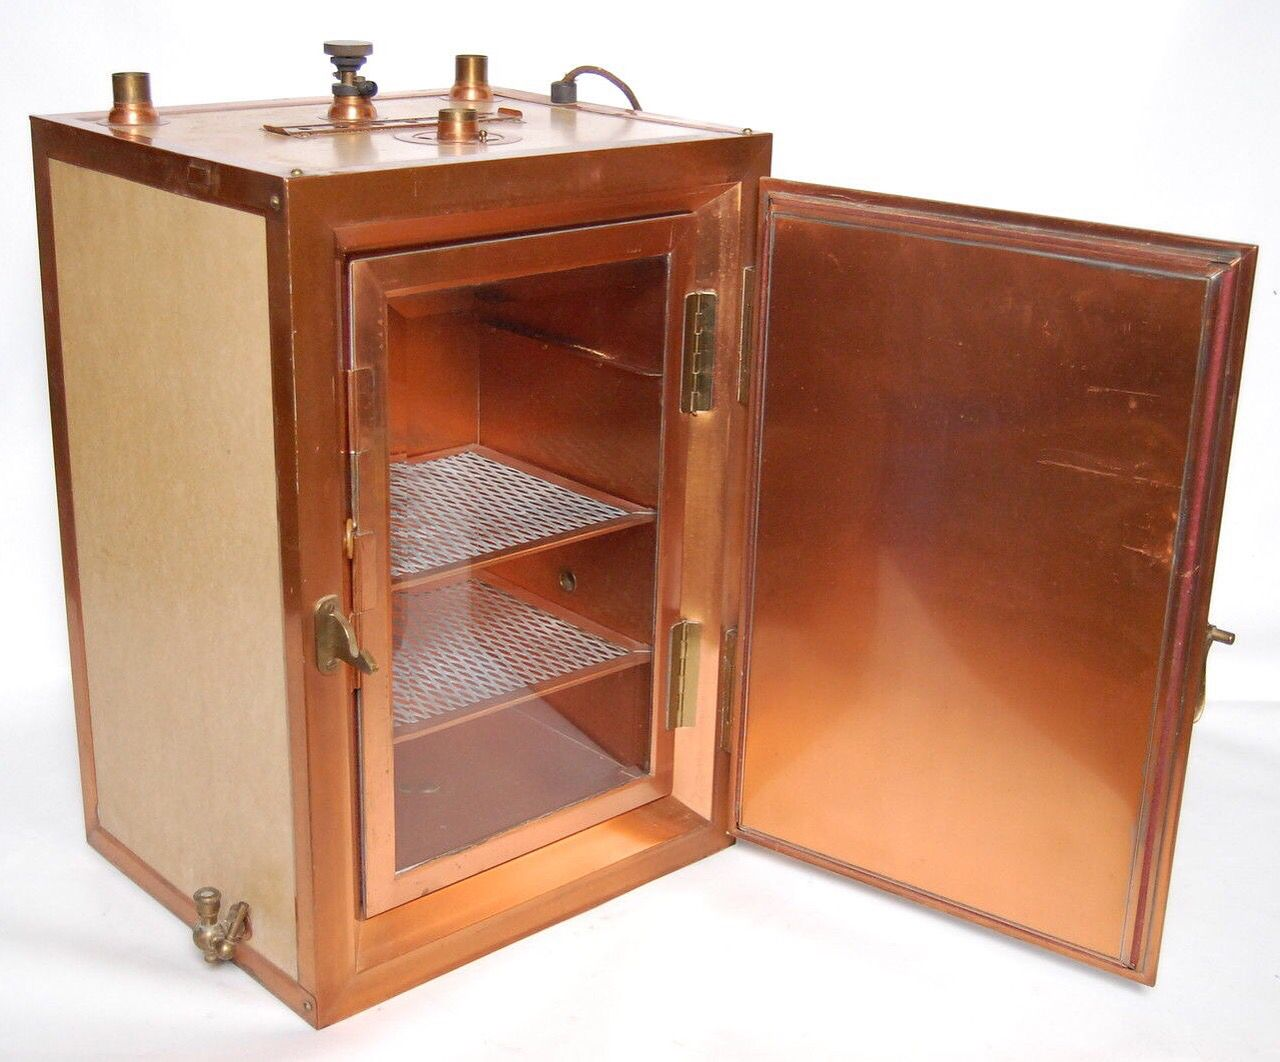 Antique copper steam sterilizer medical dental instrument